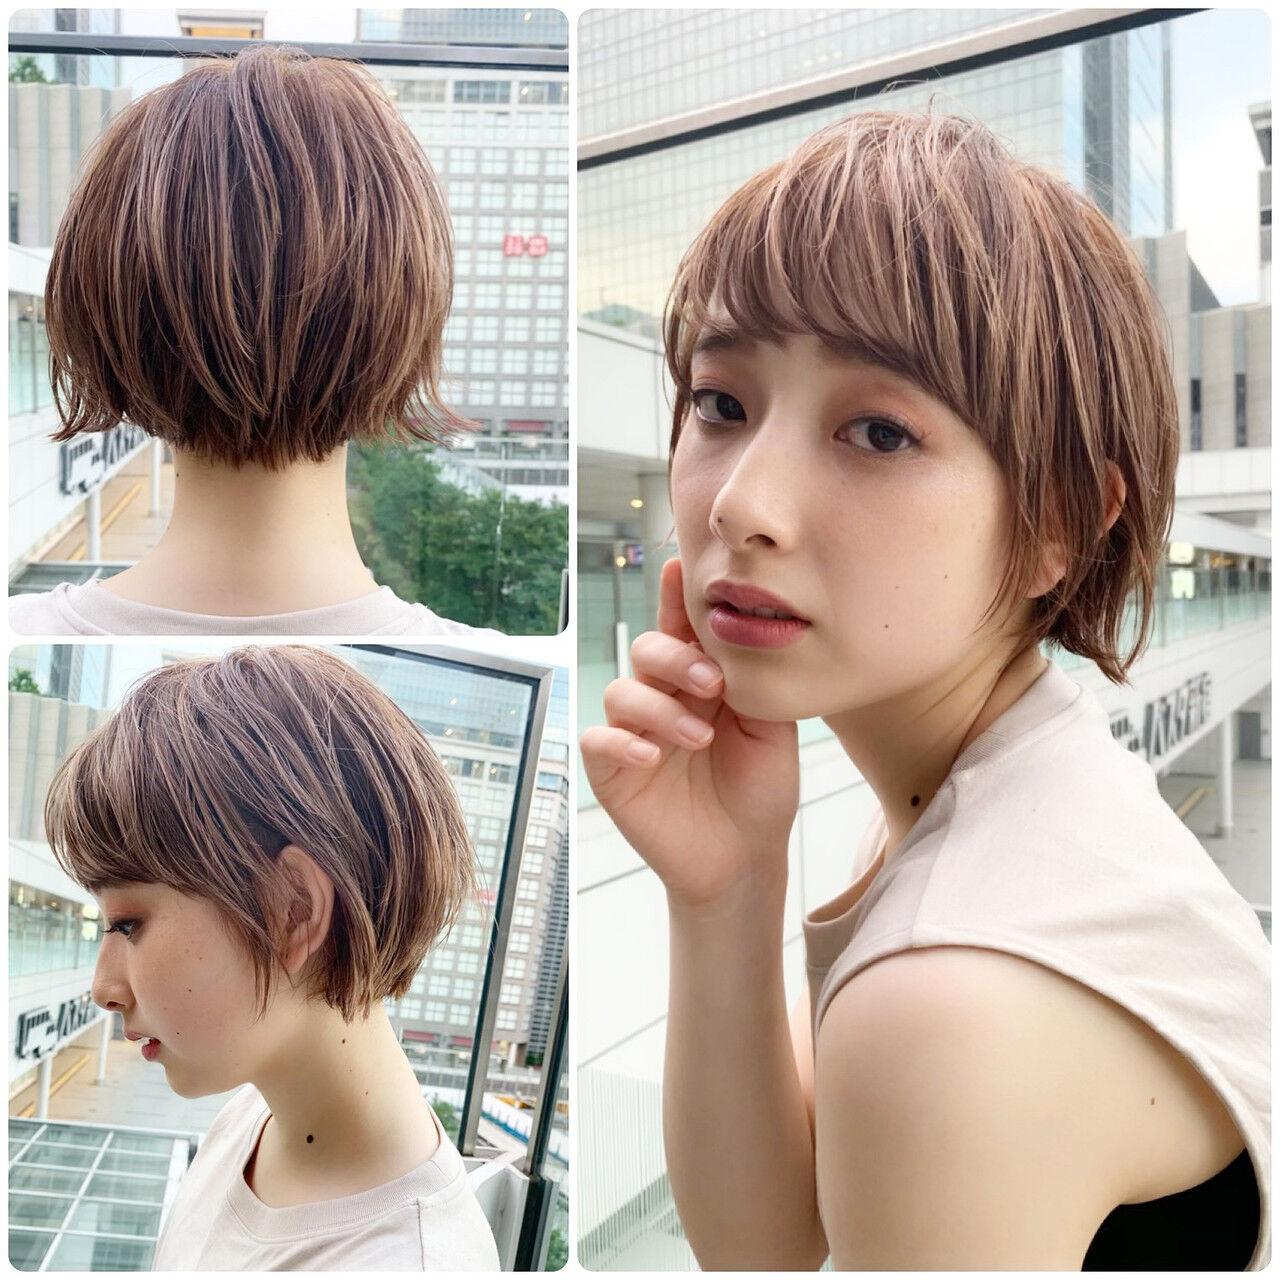 PEEK-A-BOO ハンサムショート ショート ナチュラルヘアスタイルや髪型の写真・画像